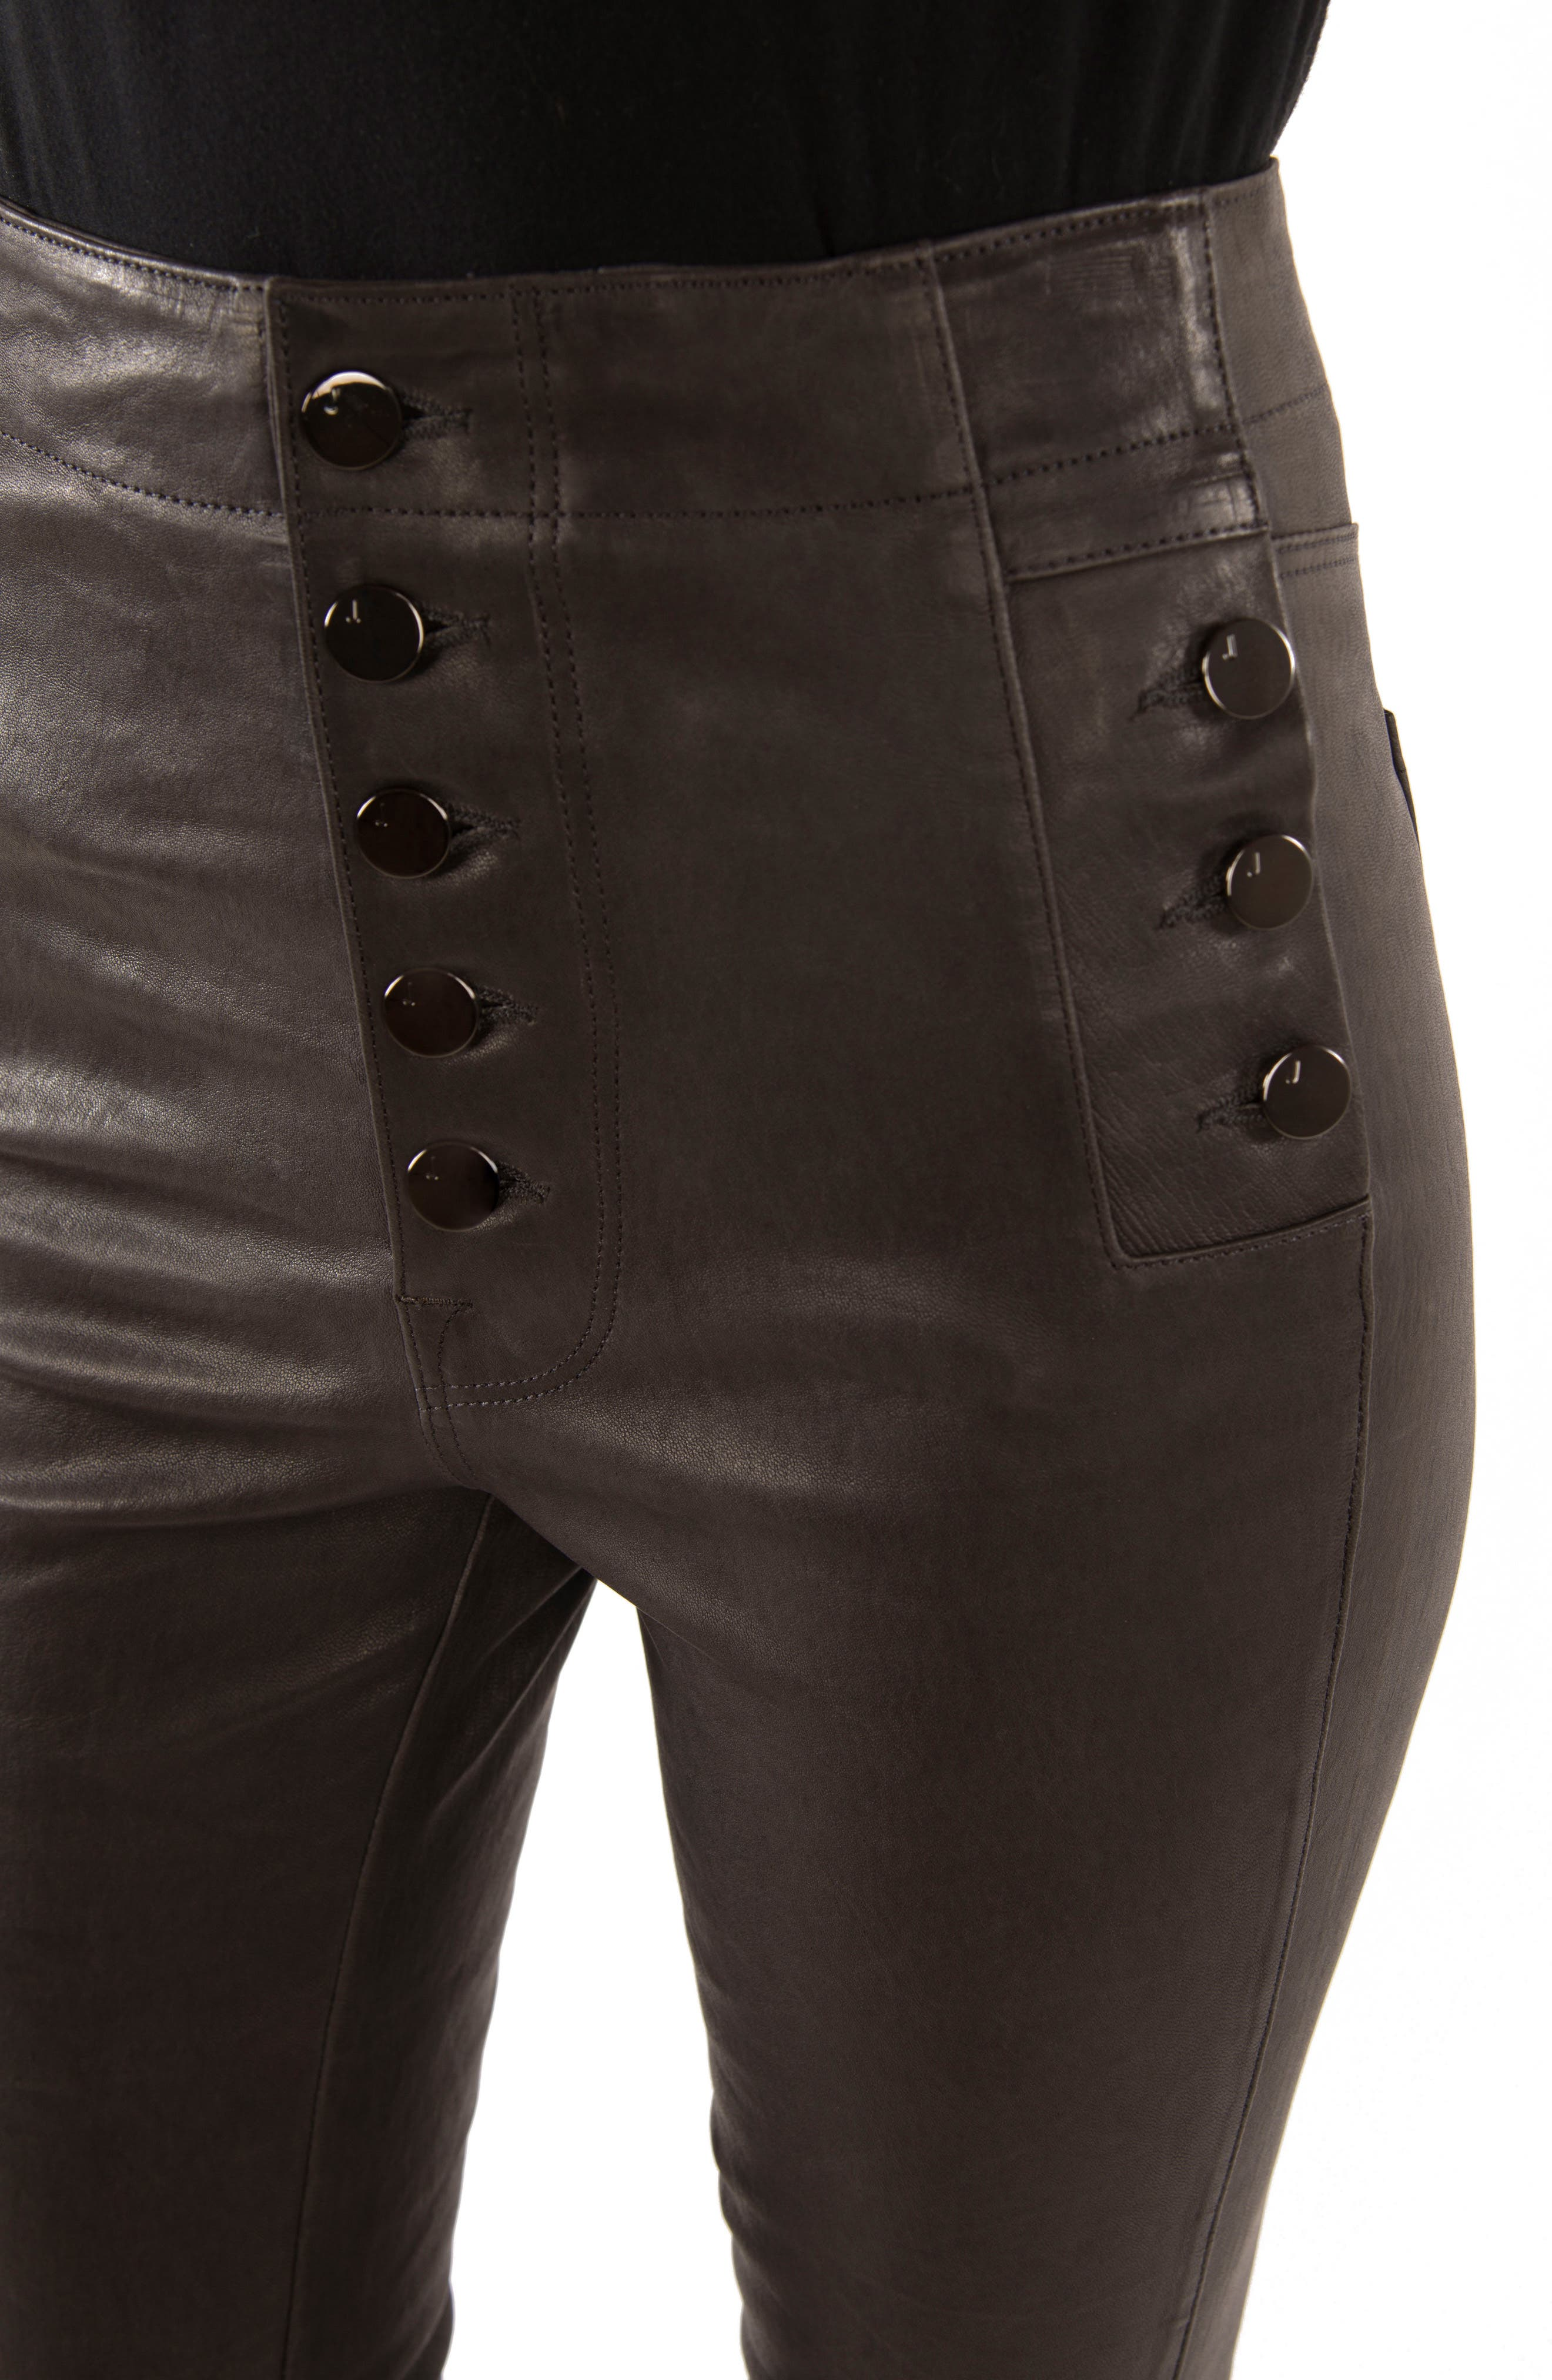 Natasha High Waist Skinny Leather Pants,                             Alternate thumbnail 4, color,                             039